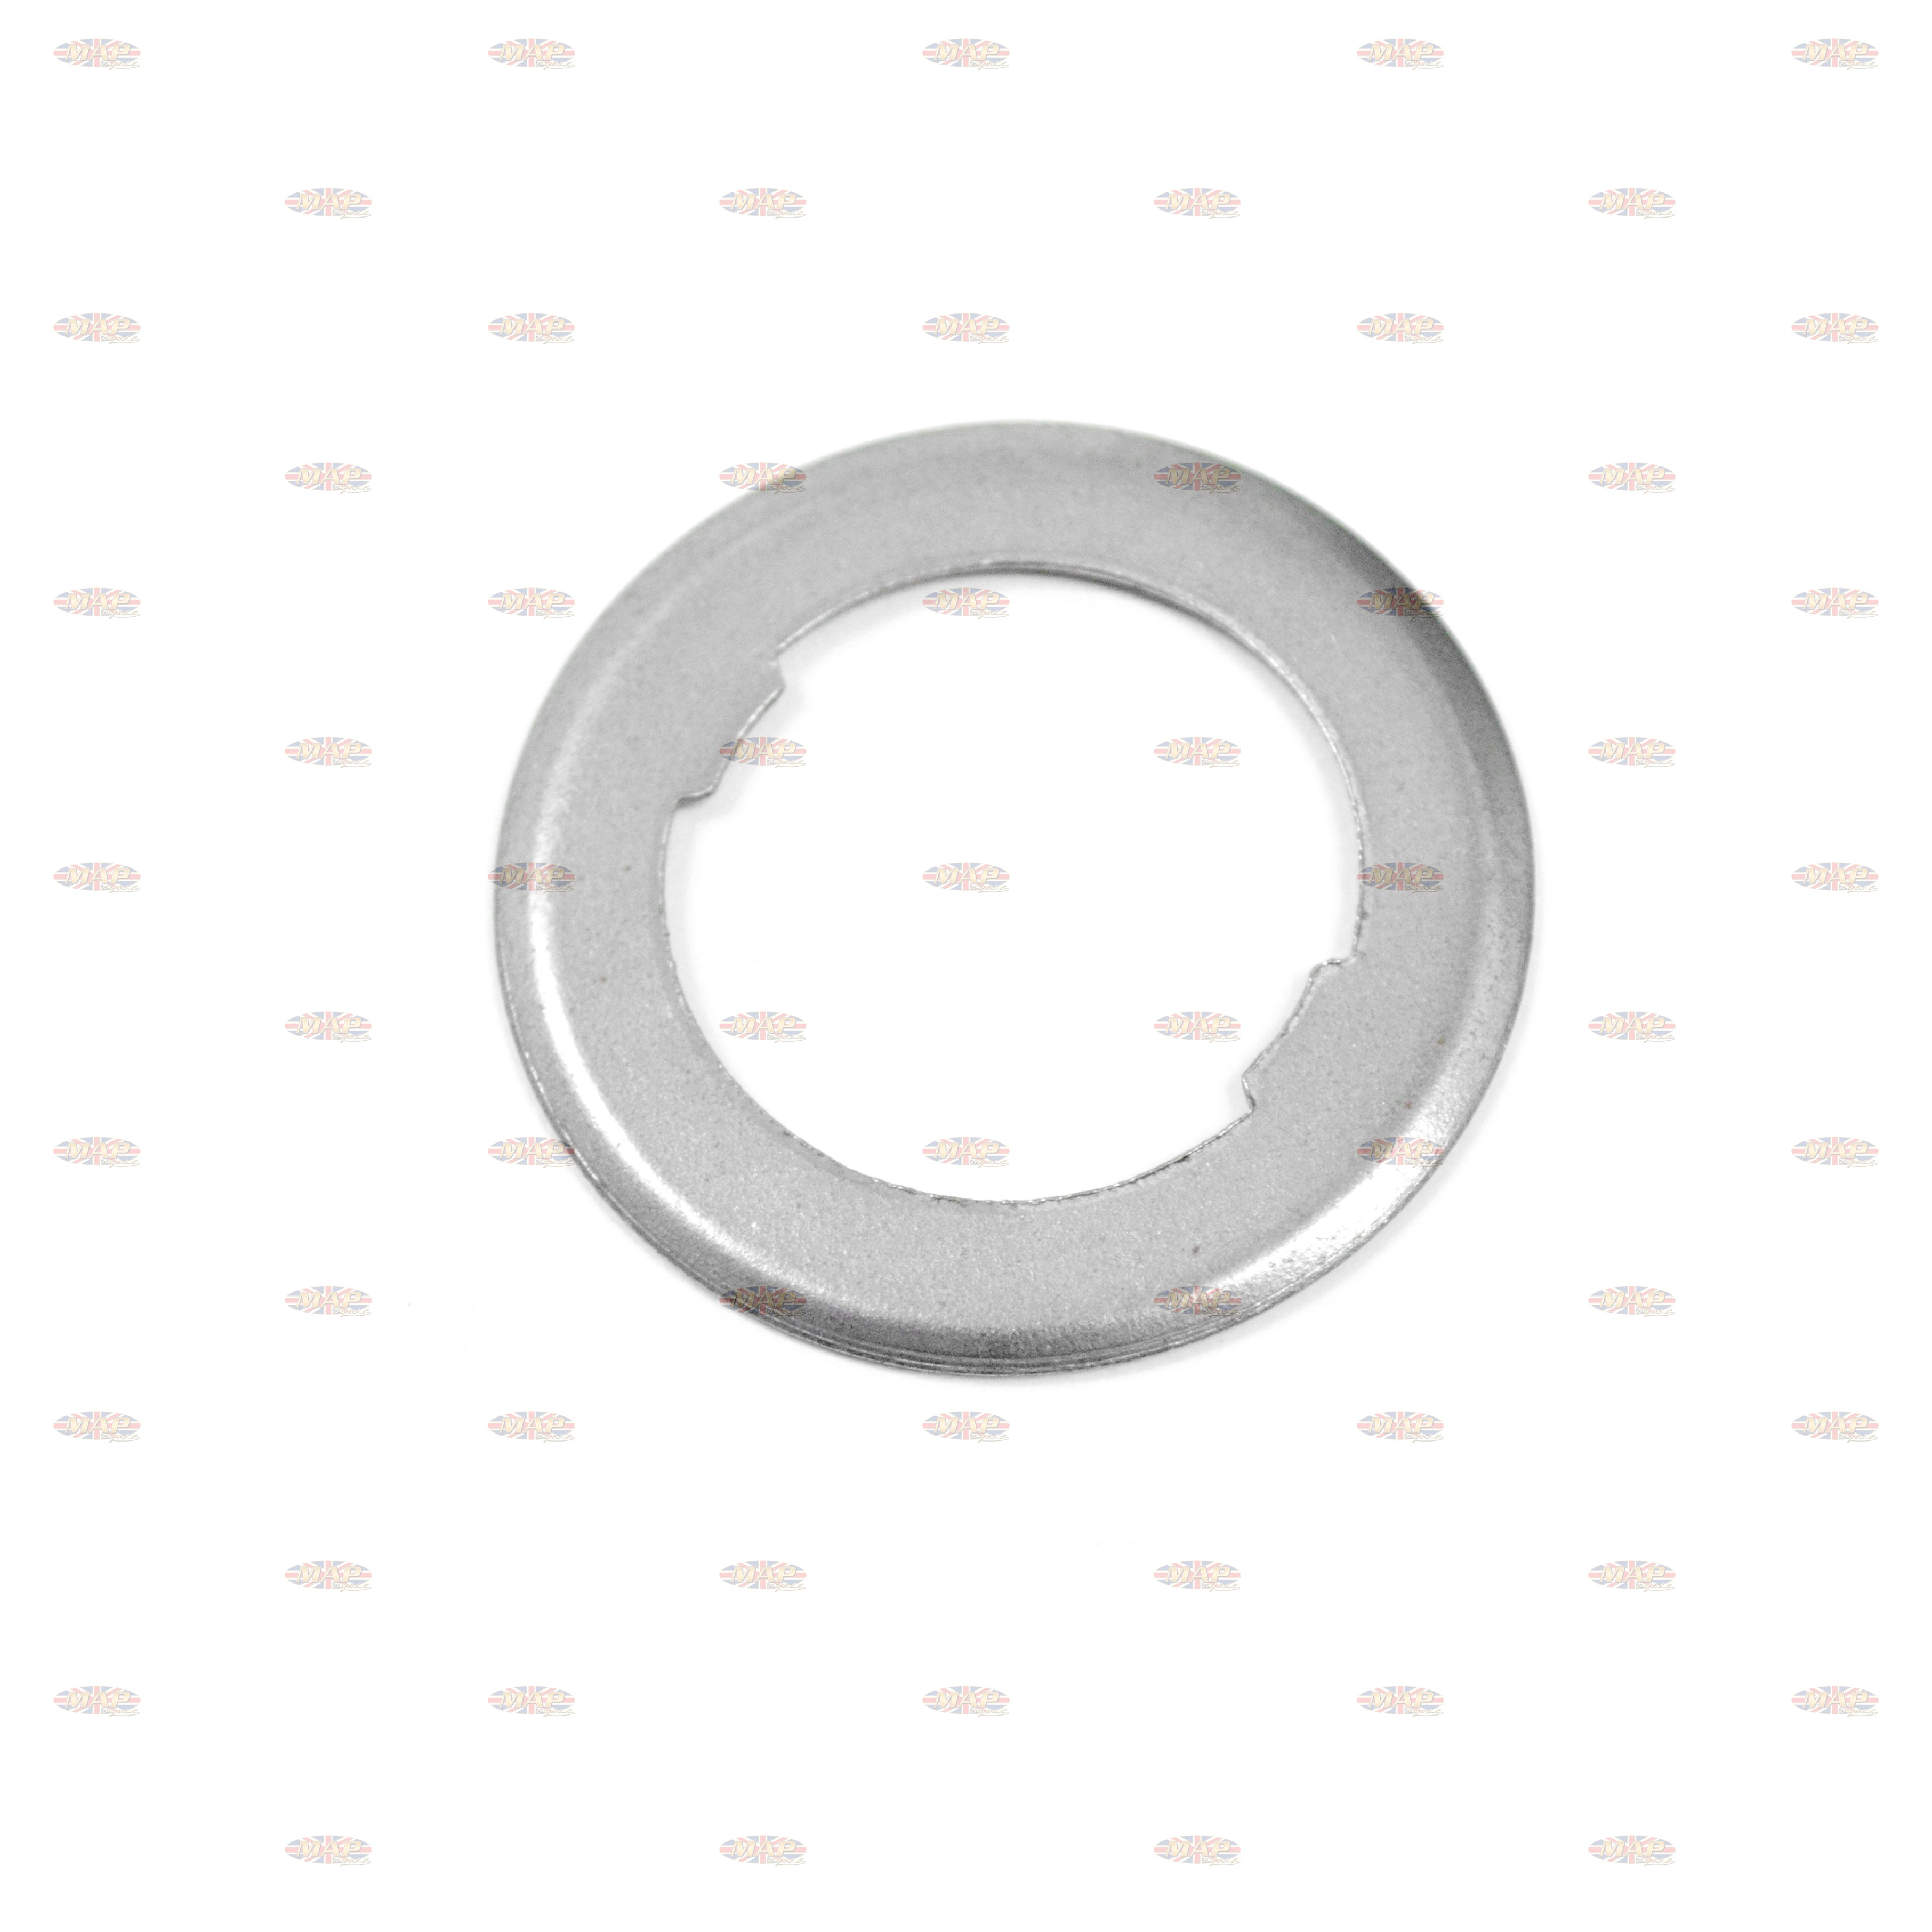 BSA, UK-Made, Countershaft Sprocket Lock Washer 57-2702